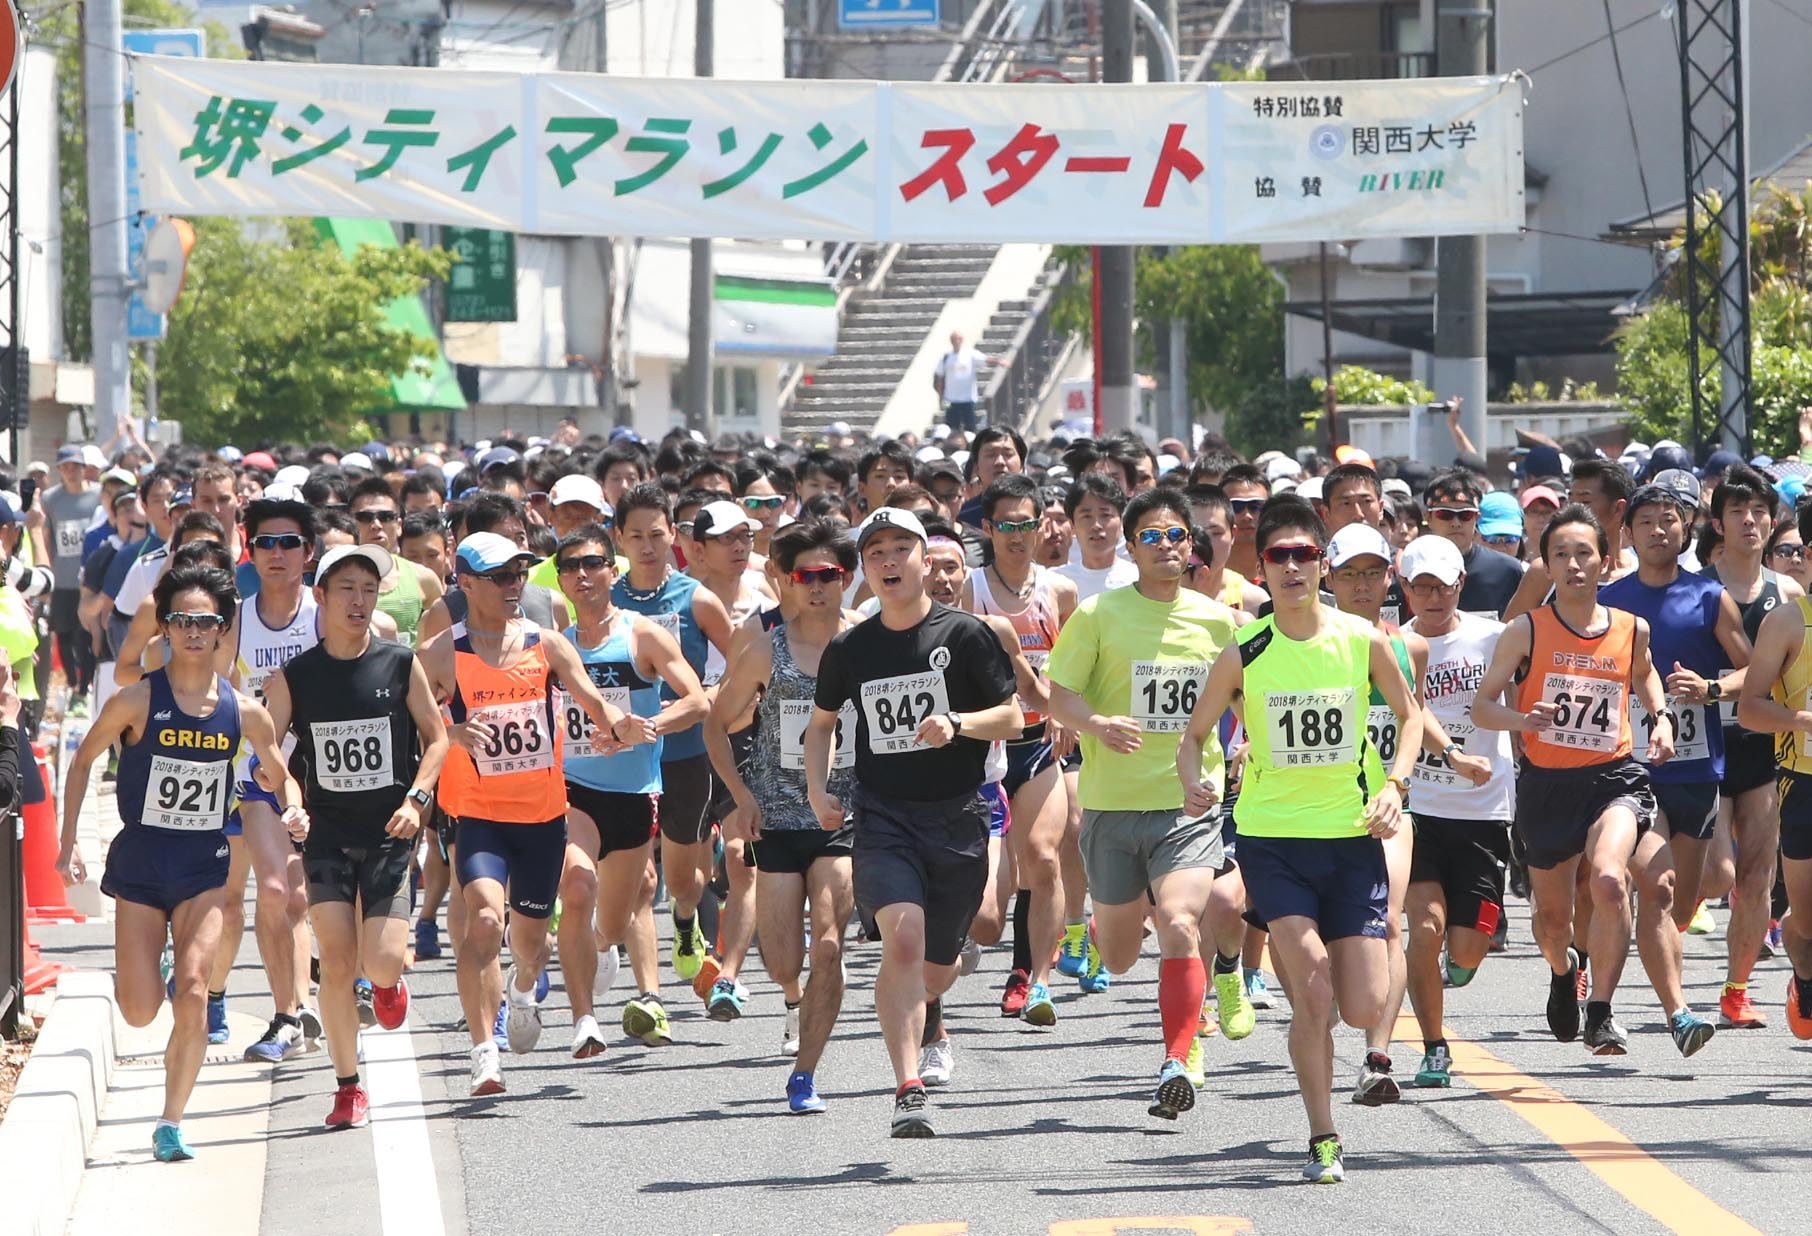 9d313eb82bed6 をテーマに開催する堺シティマラソンは、世界文化遺産の登録を目指す、大阪府堺市の仁徳天皇陵の外周と、緑豊かな大仙公園を走ります。 昭和55年の第1 回大会以…